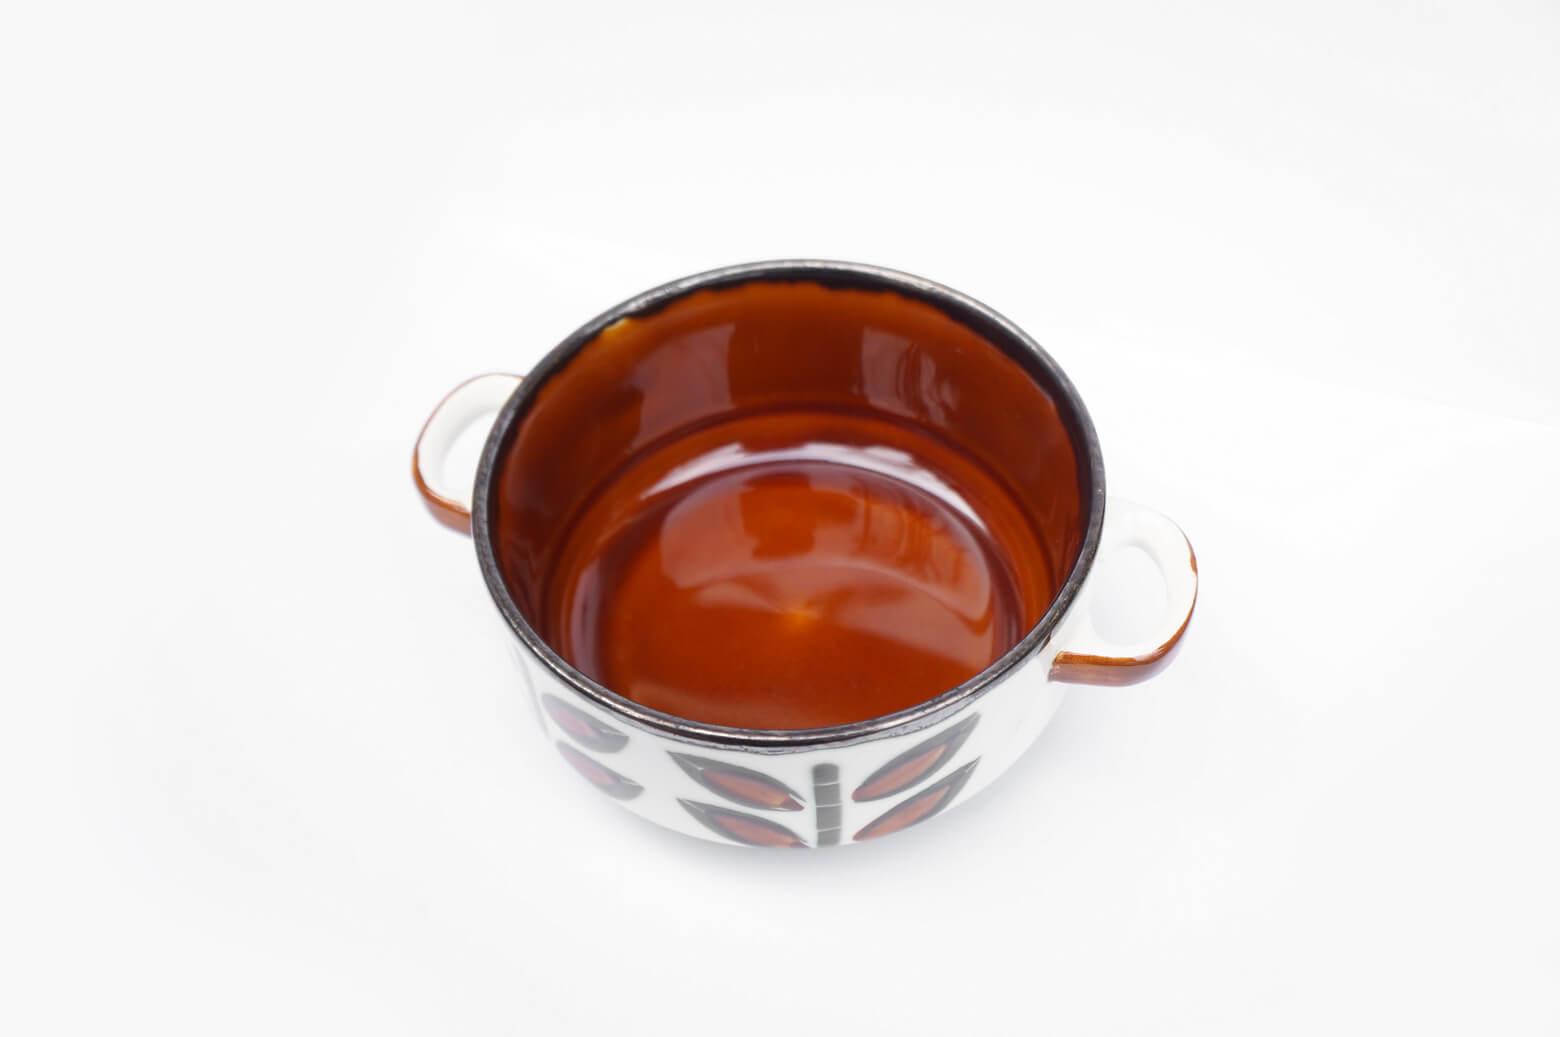 Boch Soup Bowl Rambouillet / ボッホ スープボウル ランブイエ ヴィンテージ 食器 ベルギー 雑貨 1